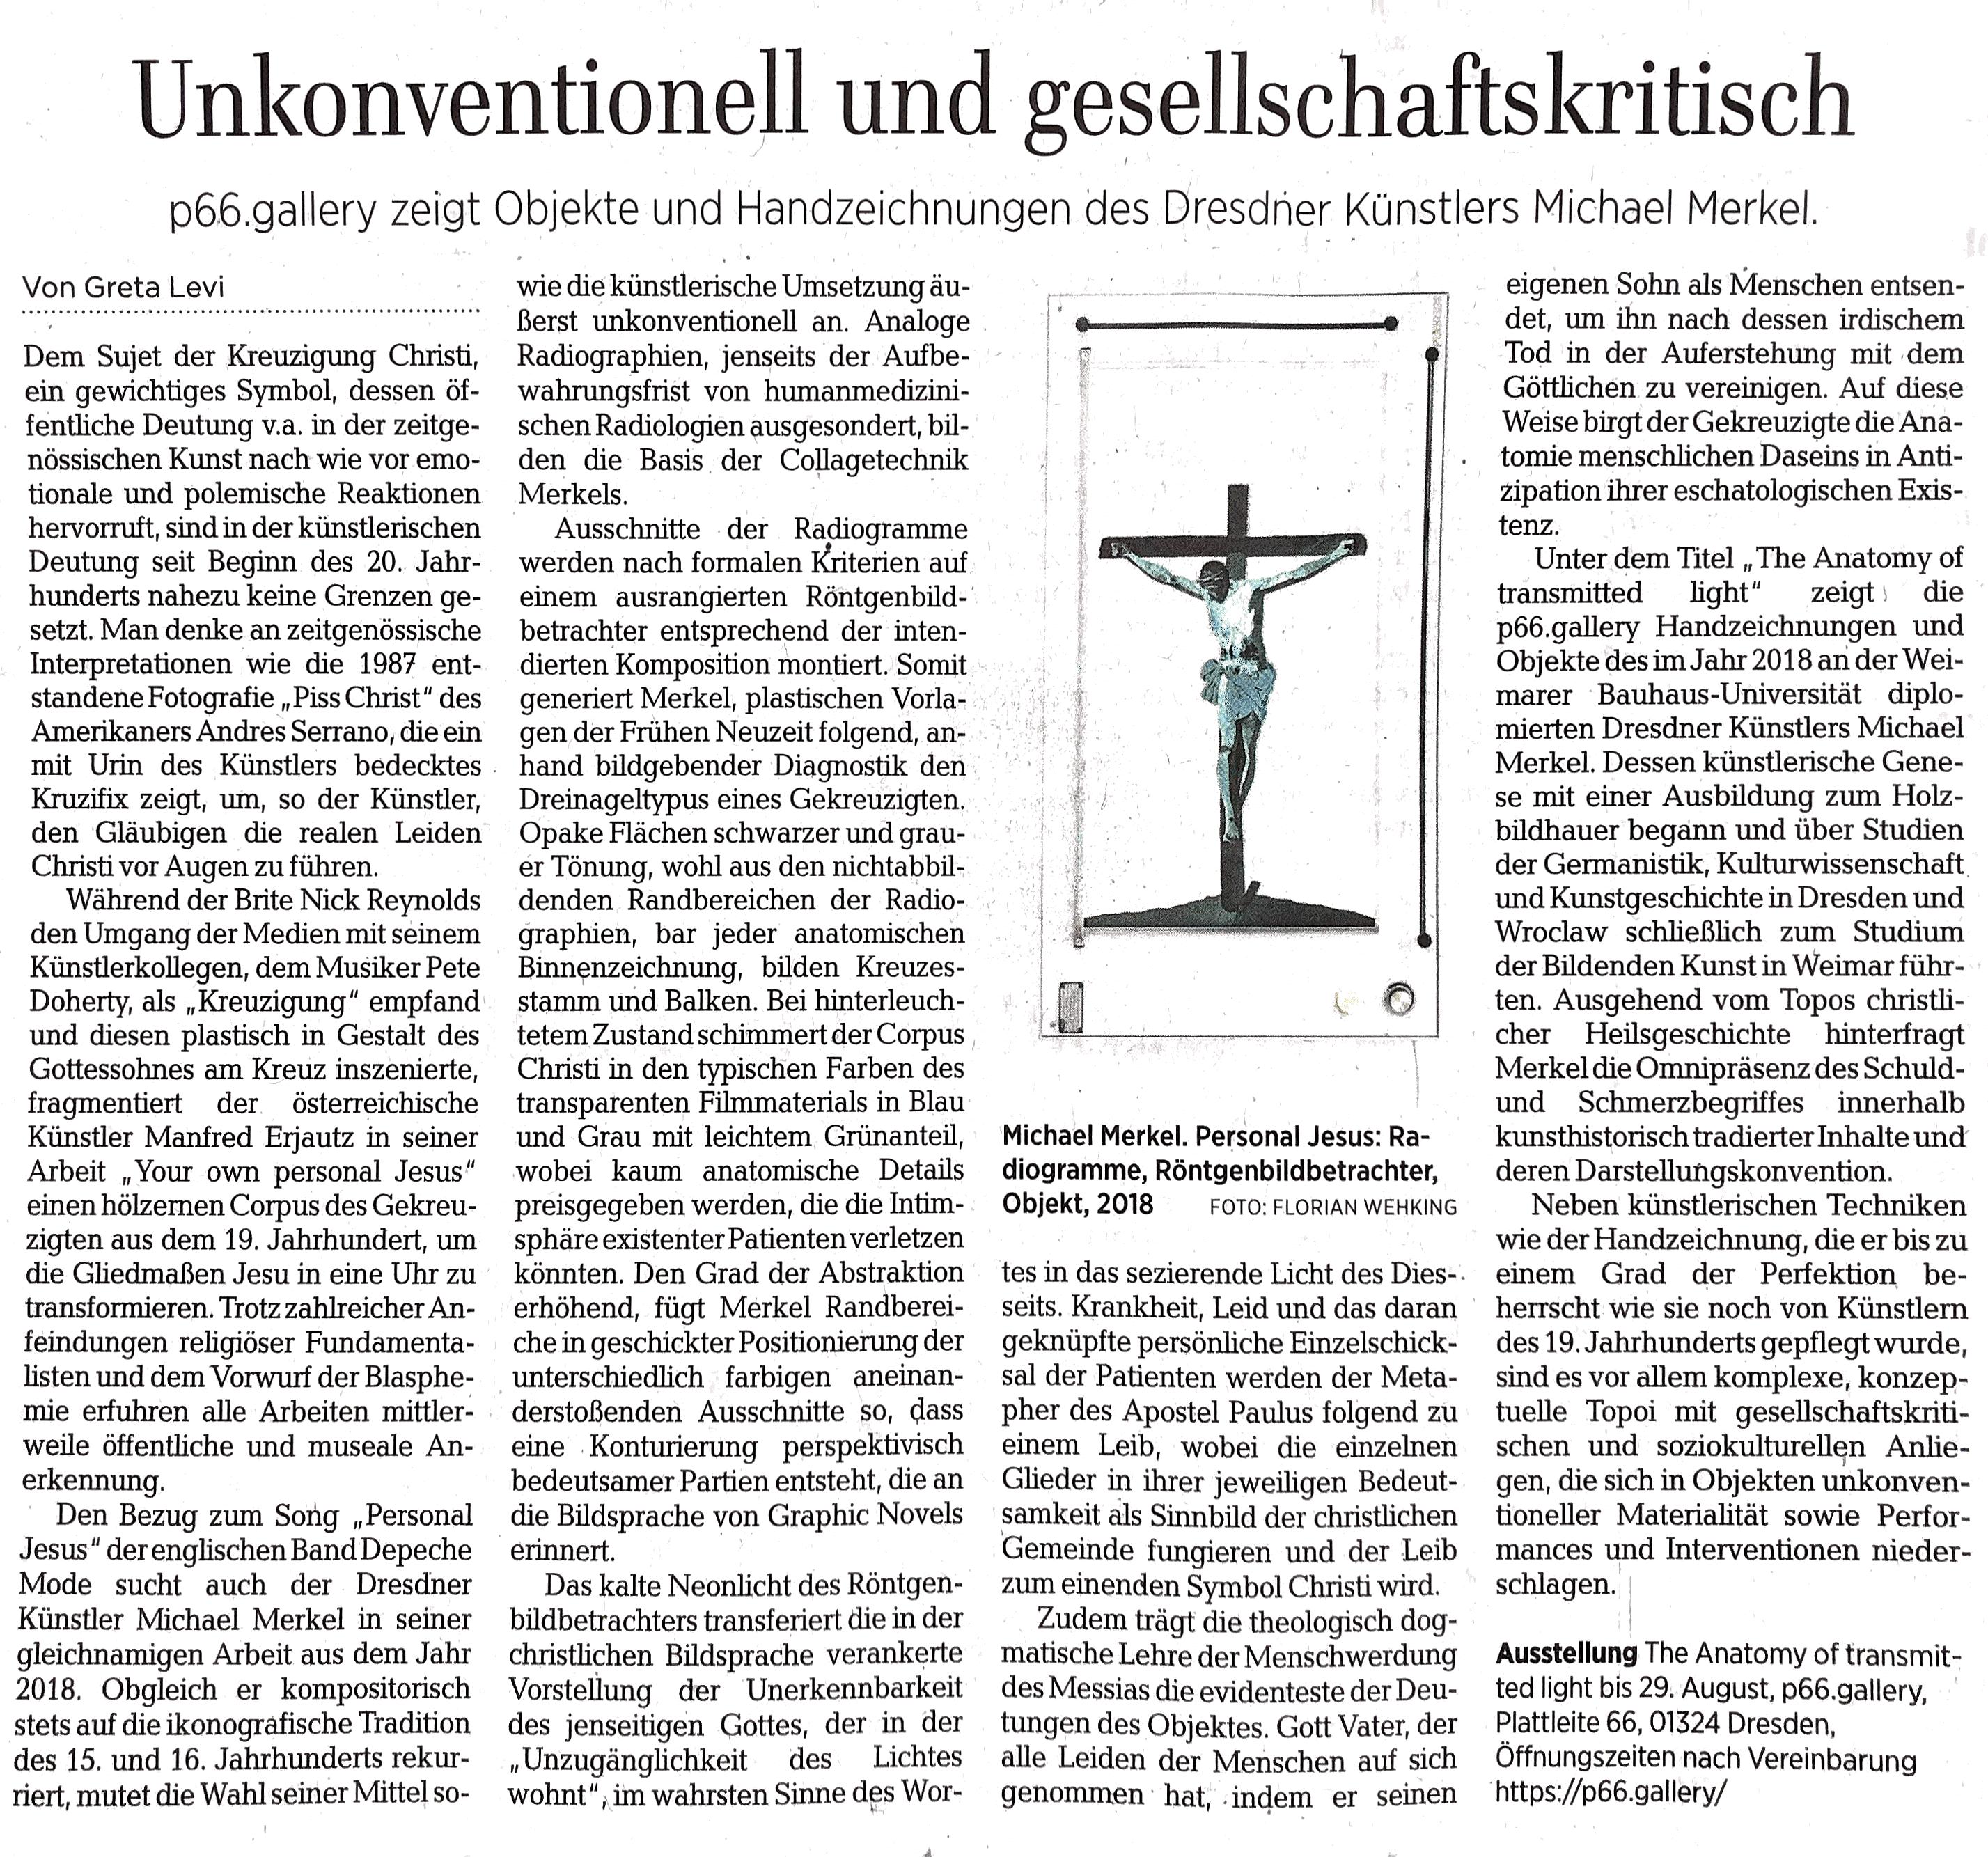 DNN Rezension - Michael Merkel - the anatomy of transmitted light